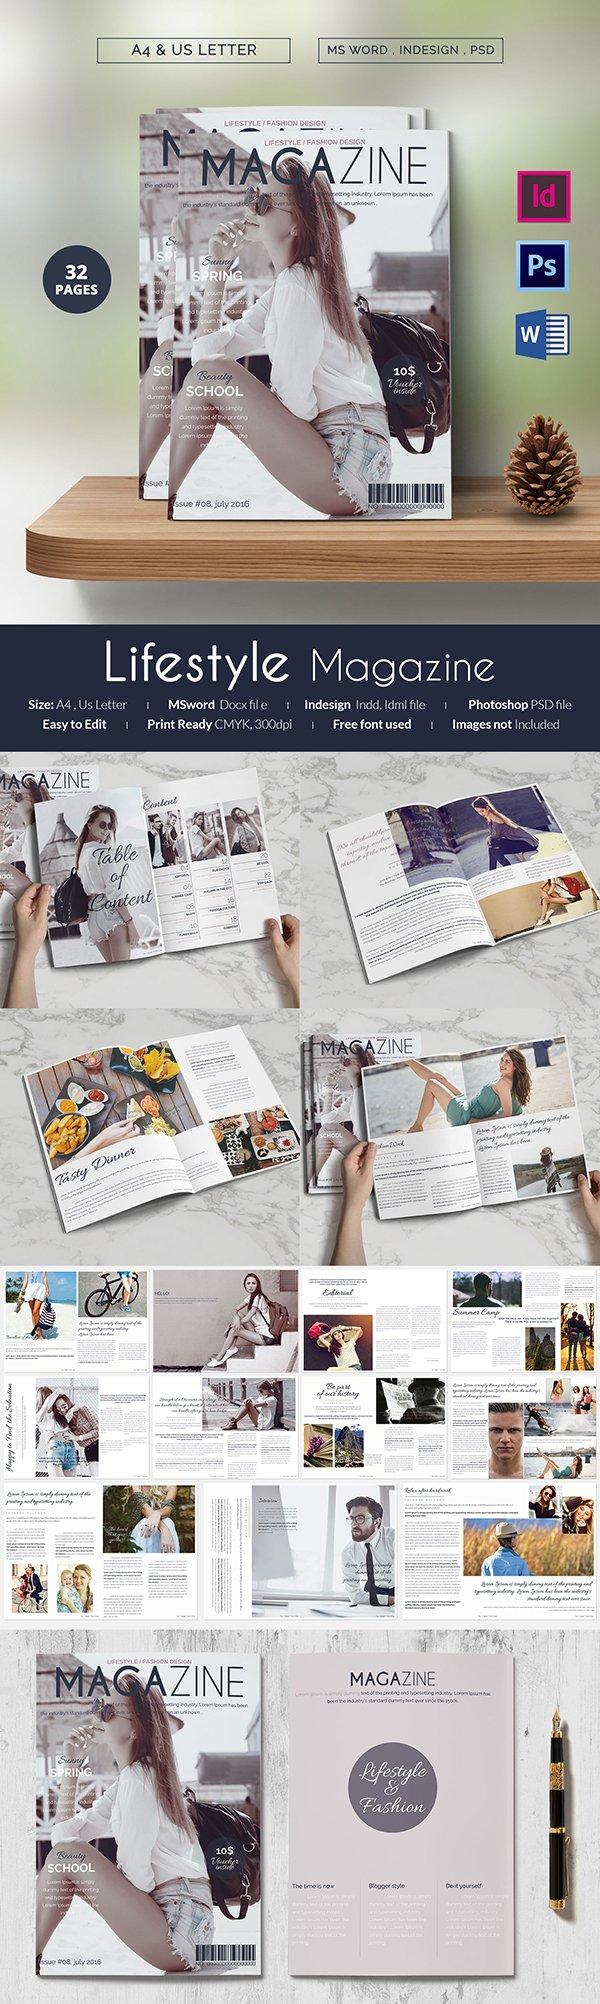 lifestylemagazine600